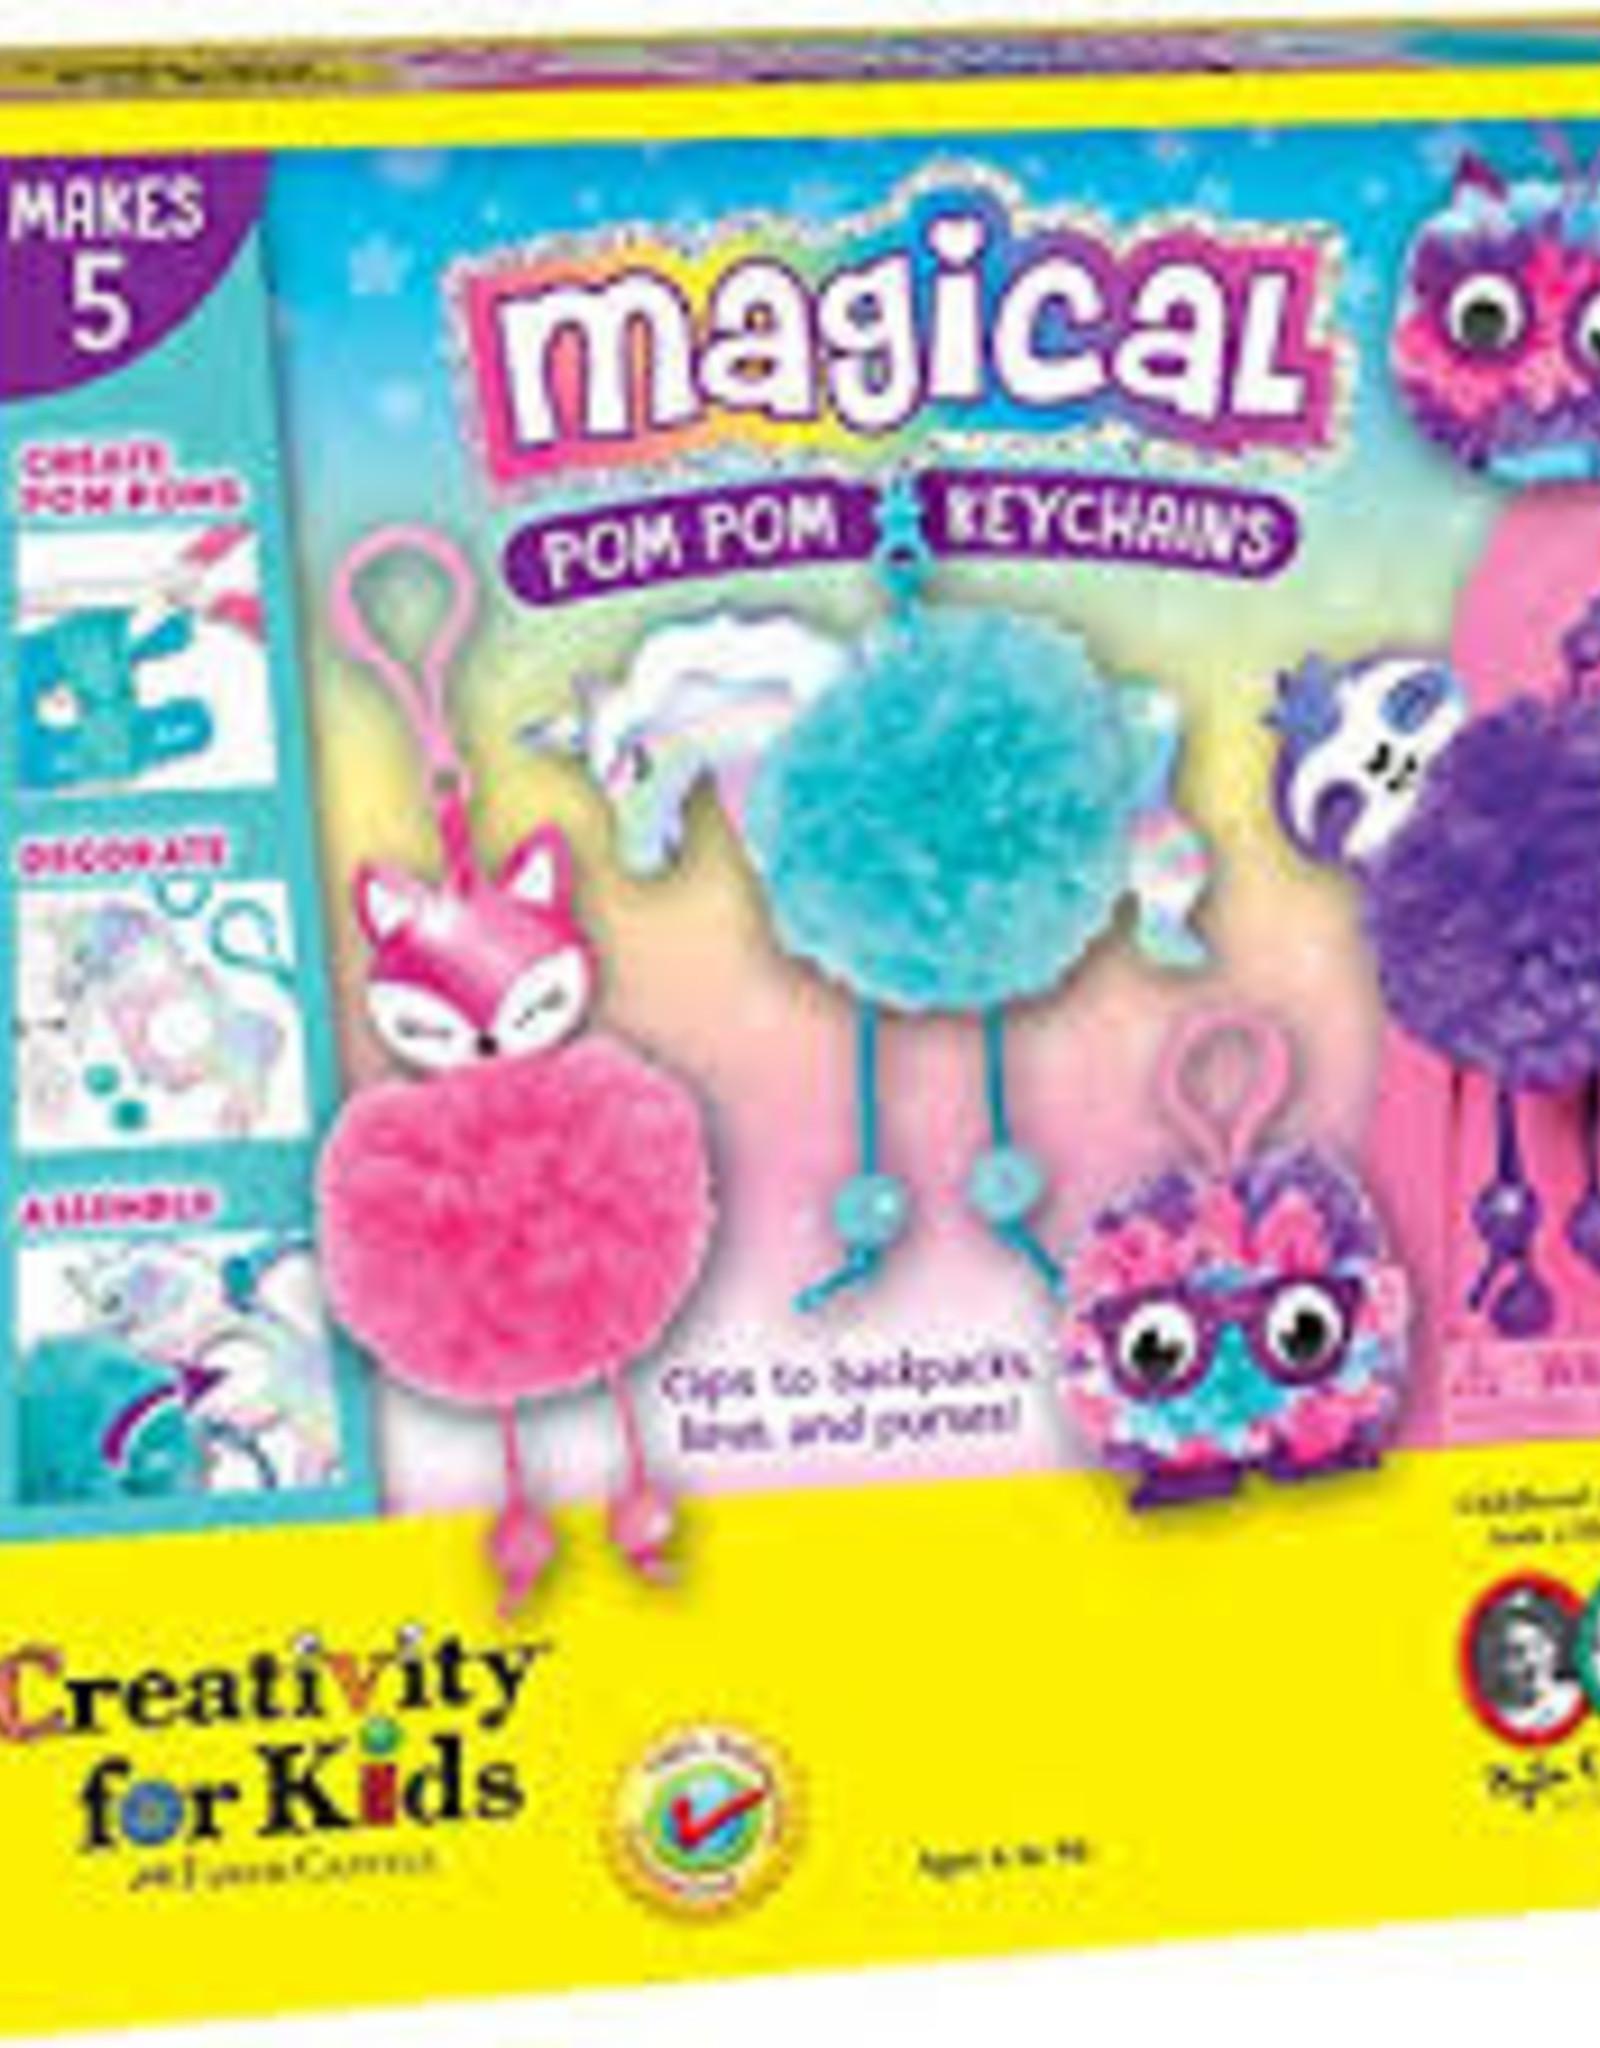 Creativity For Kids Magical Pom Poms Keychains